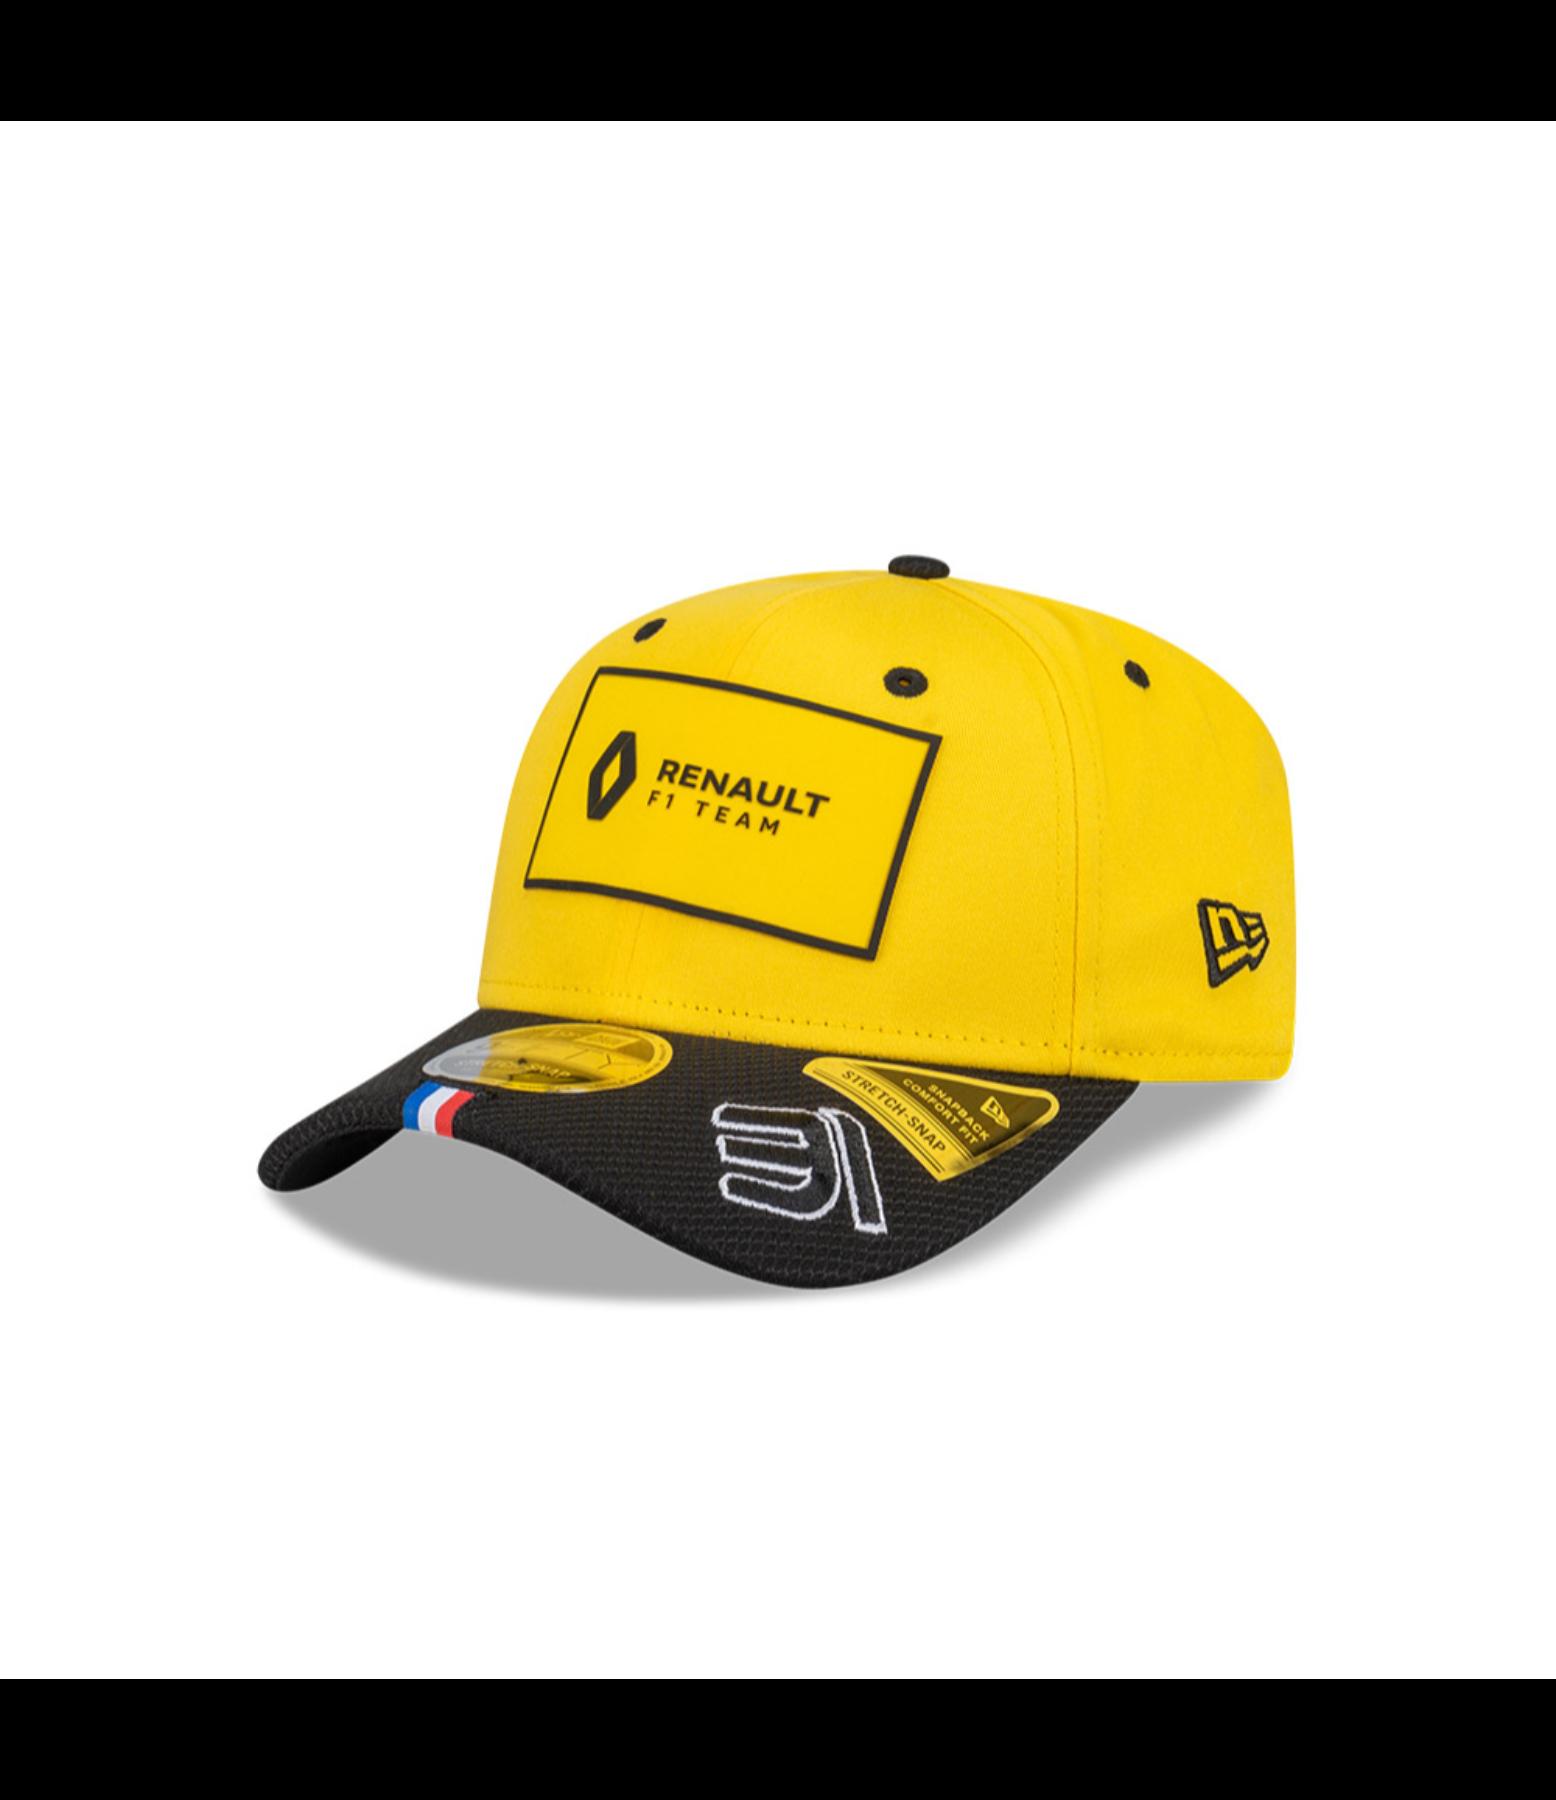 RENAULT DP WORLD F1 TEAM 2020 Ocon New Era Cap - yellow